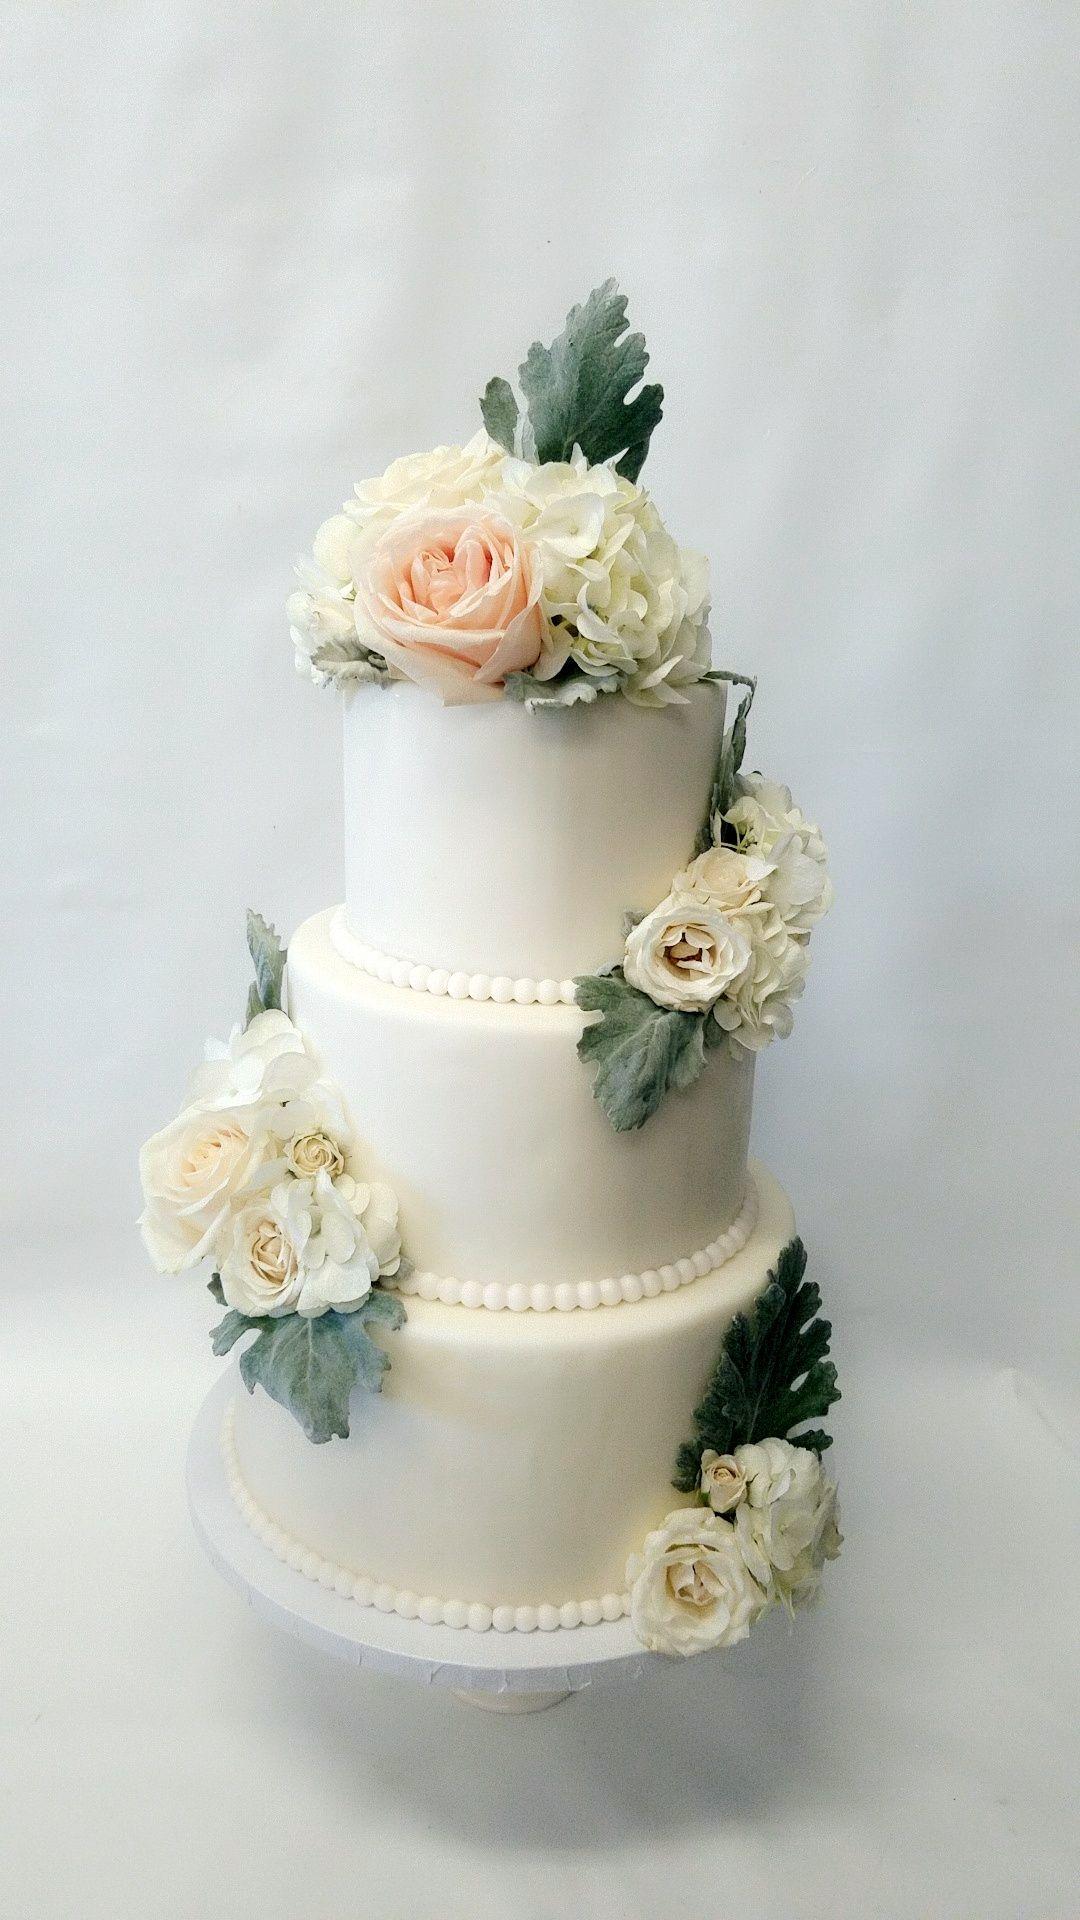 Ettore's Wedding And Custom Design Cake